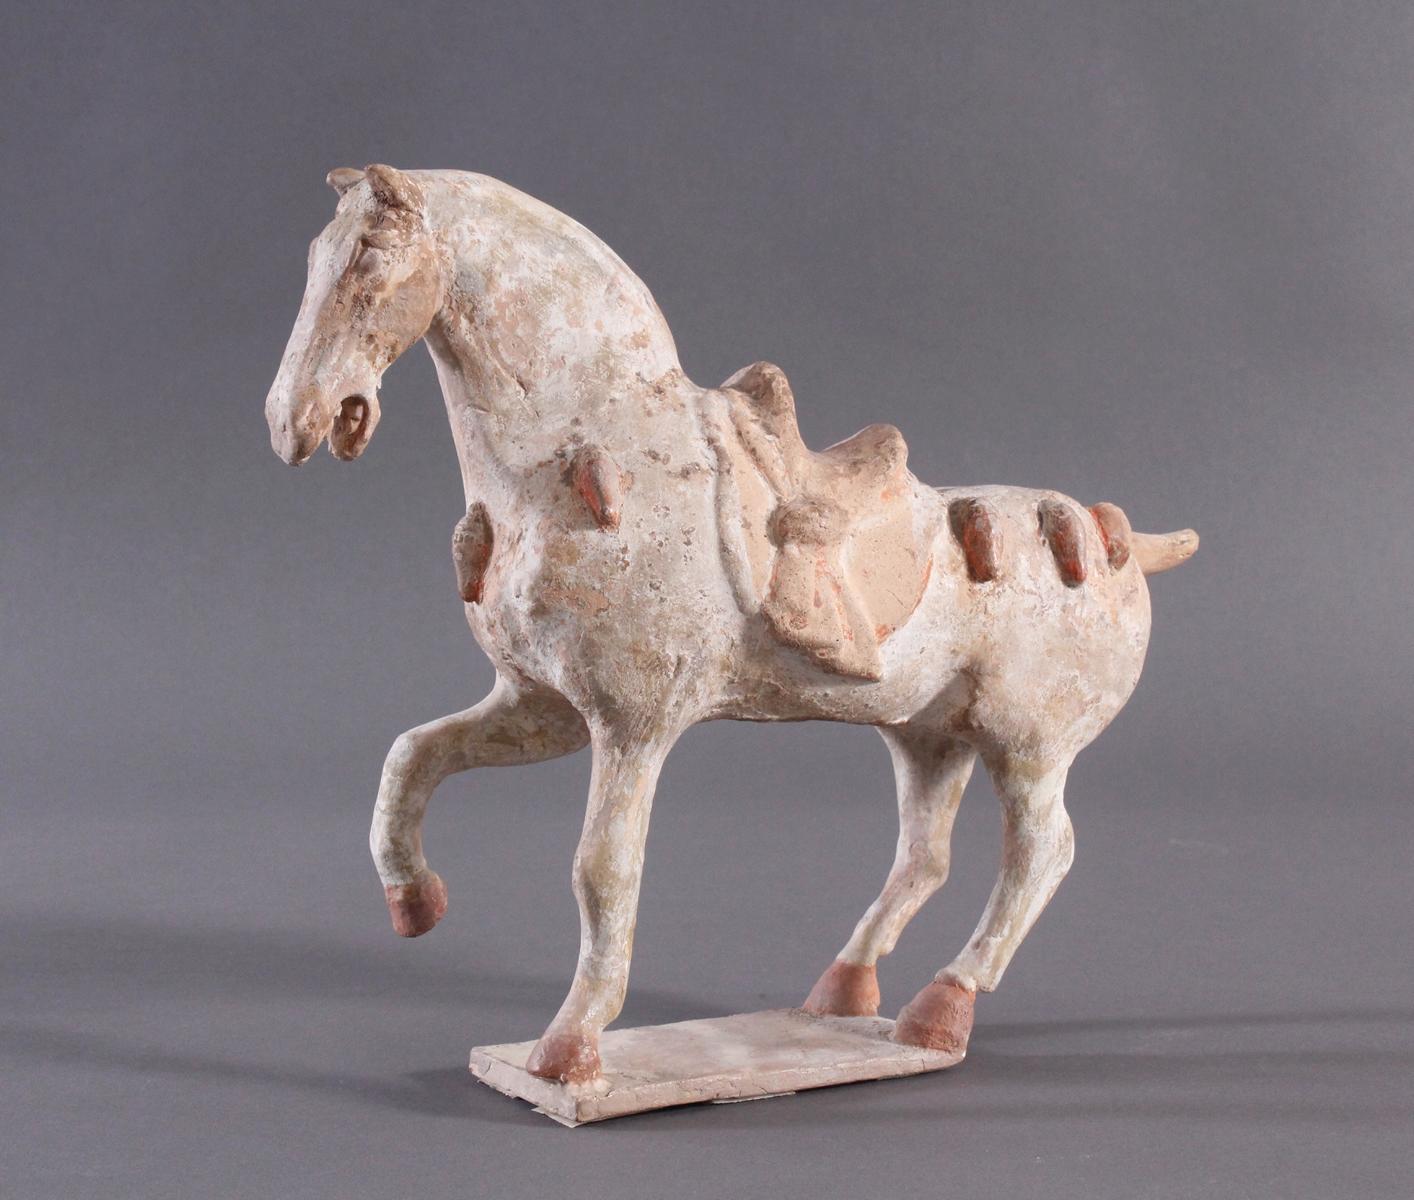 China Tang-Dynastie, Pferd aus gebranntem Ton